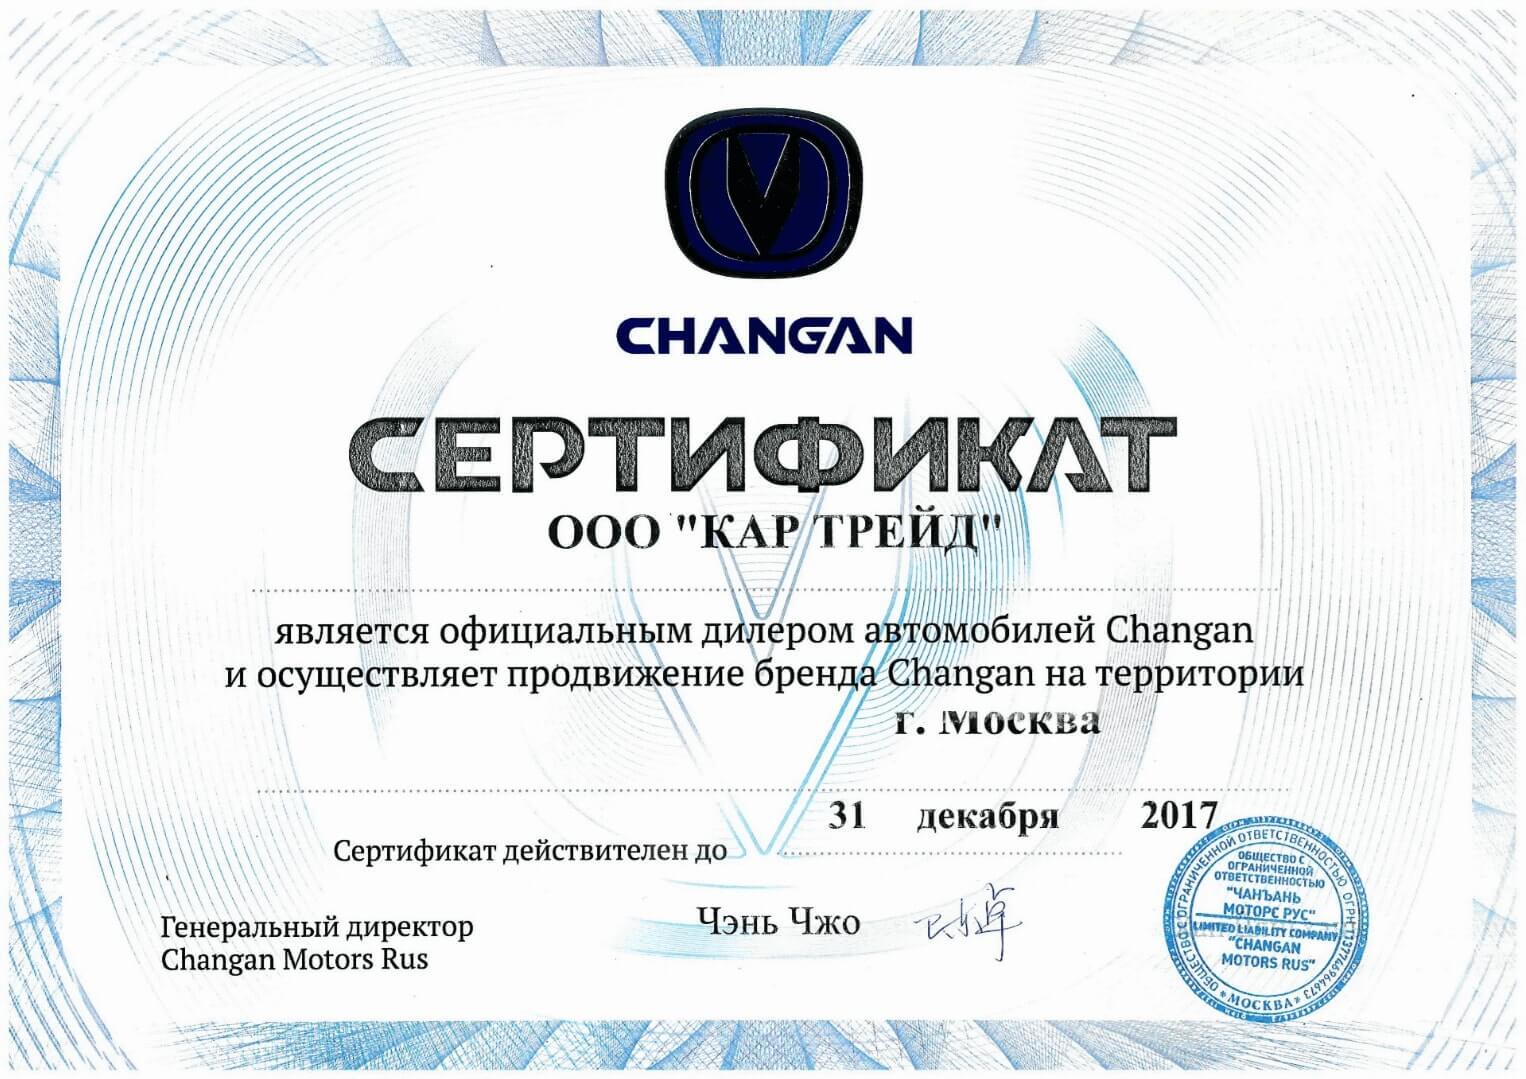 Автосалон «ДАВ-АВТО (Урал-Авто-Форум)», официальный дилер Опель